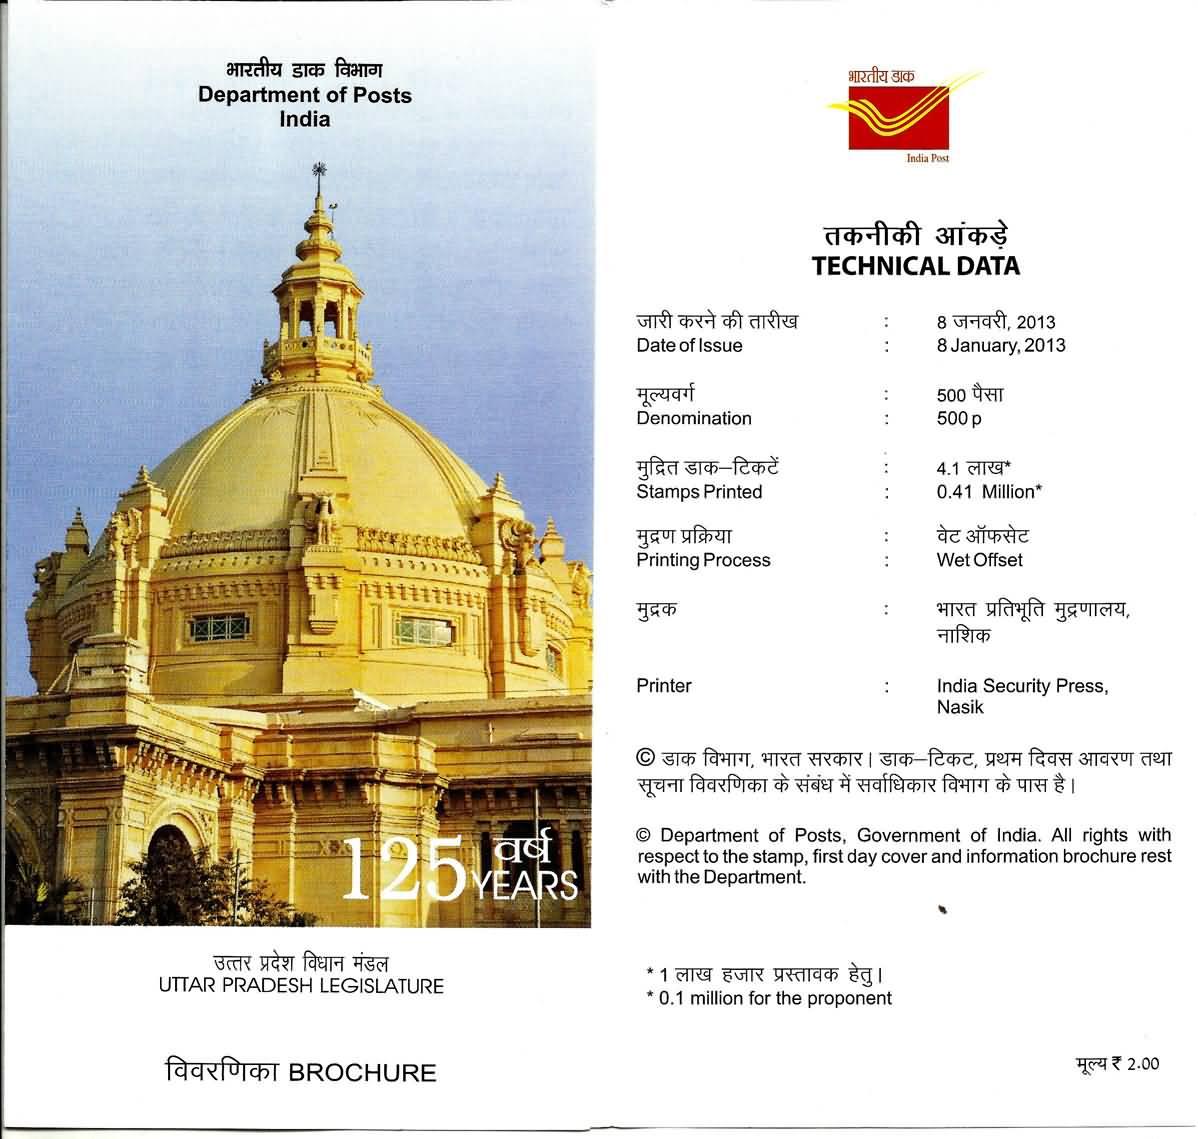 education and research institute uttar pradesh tenders dating